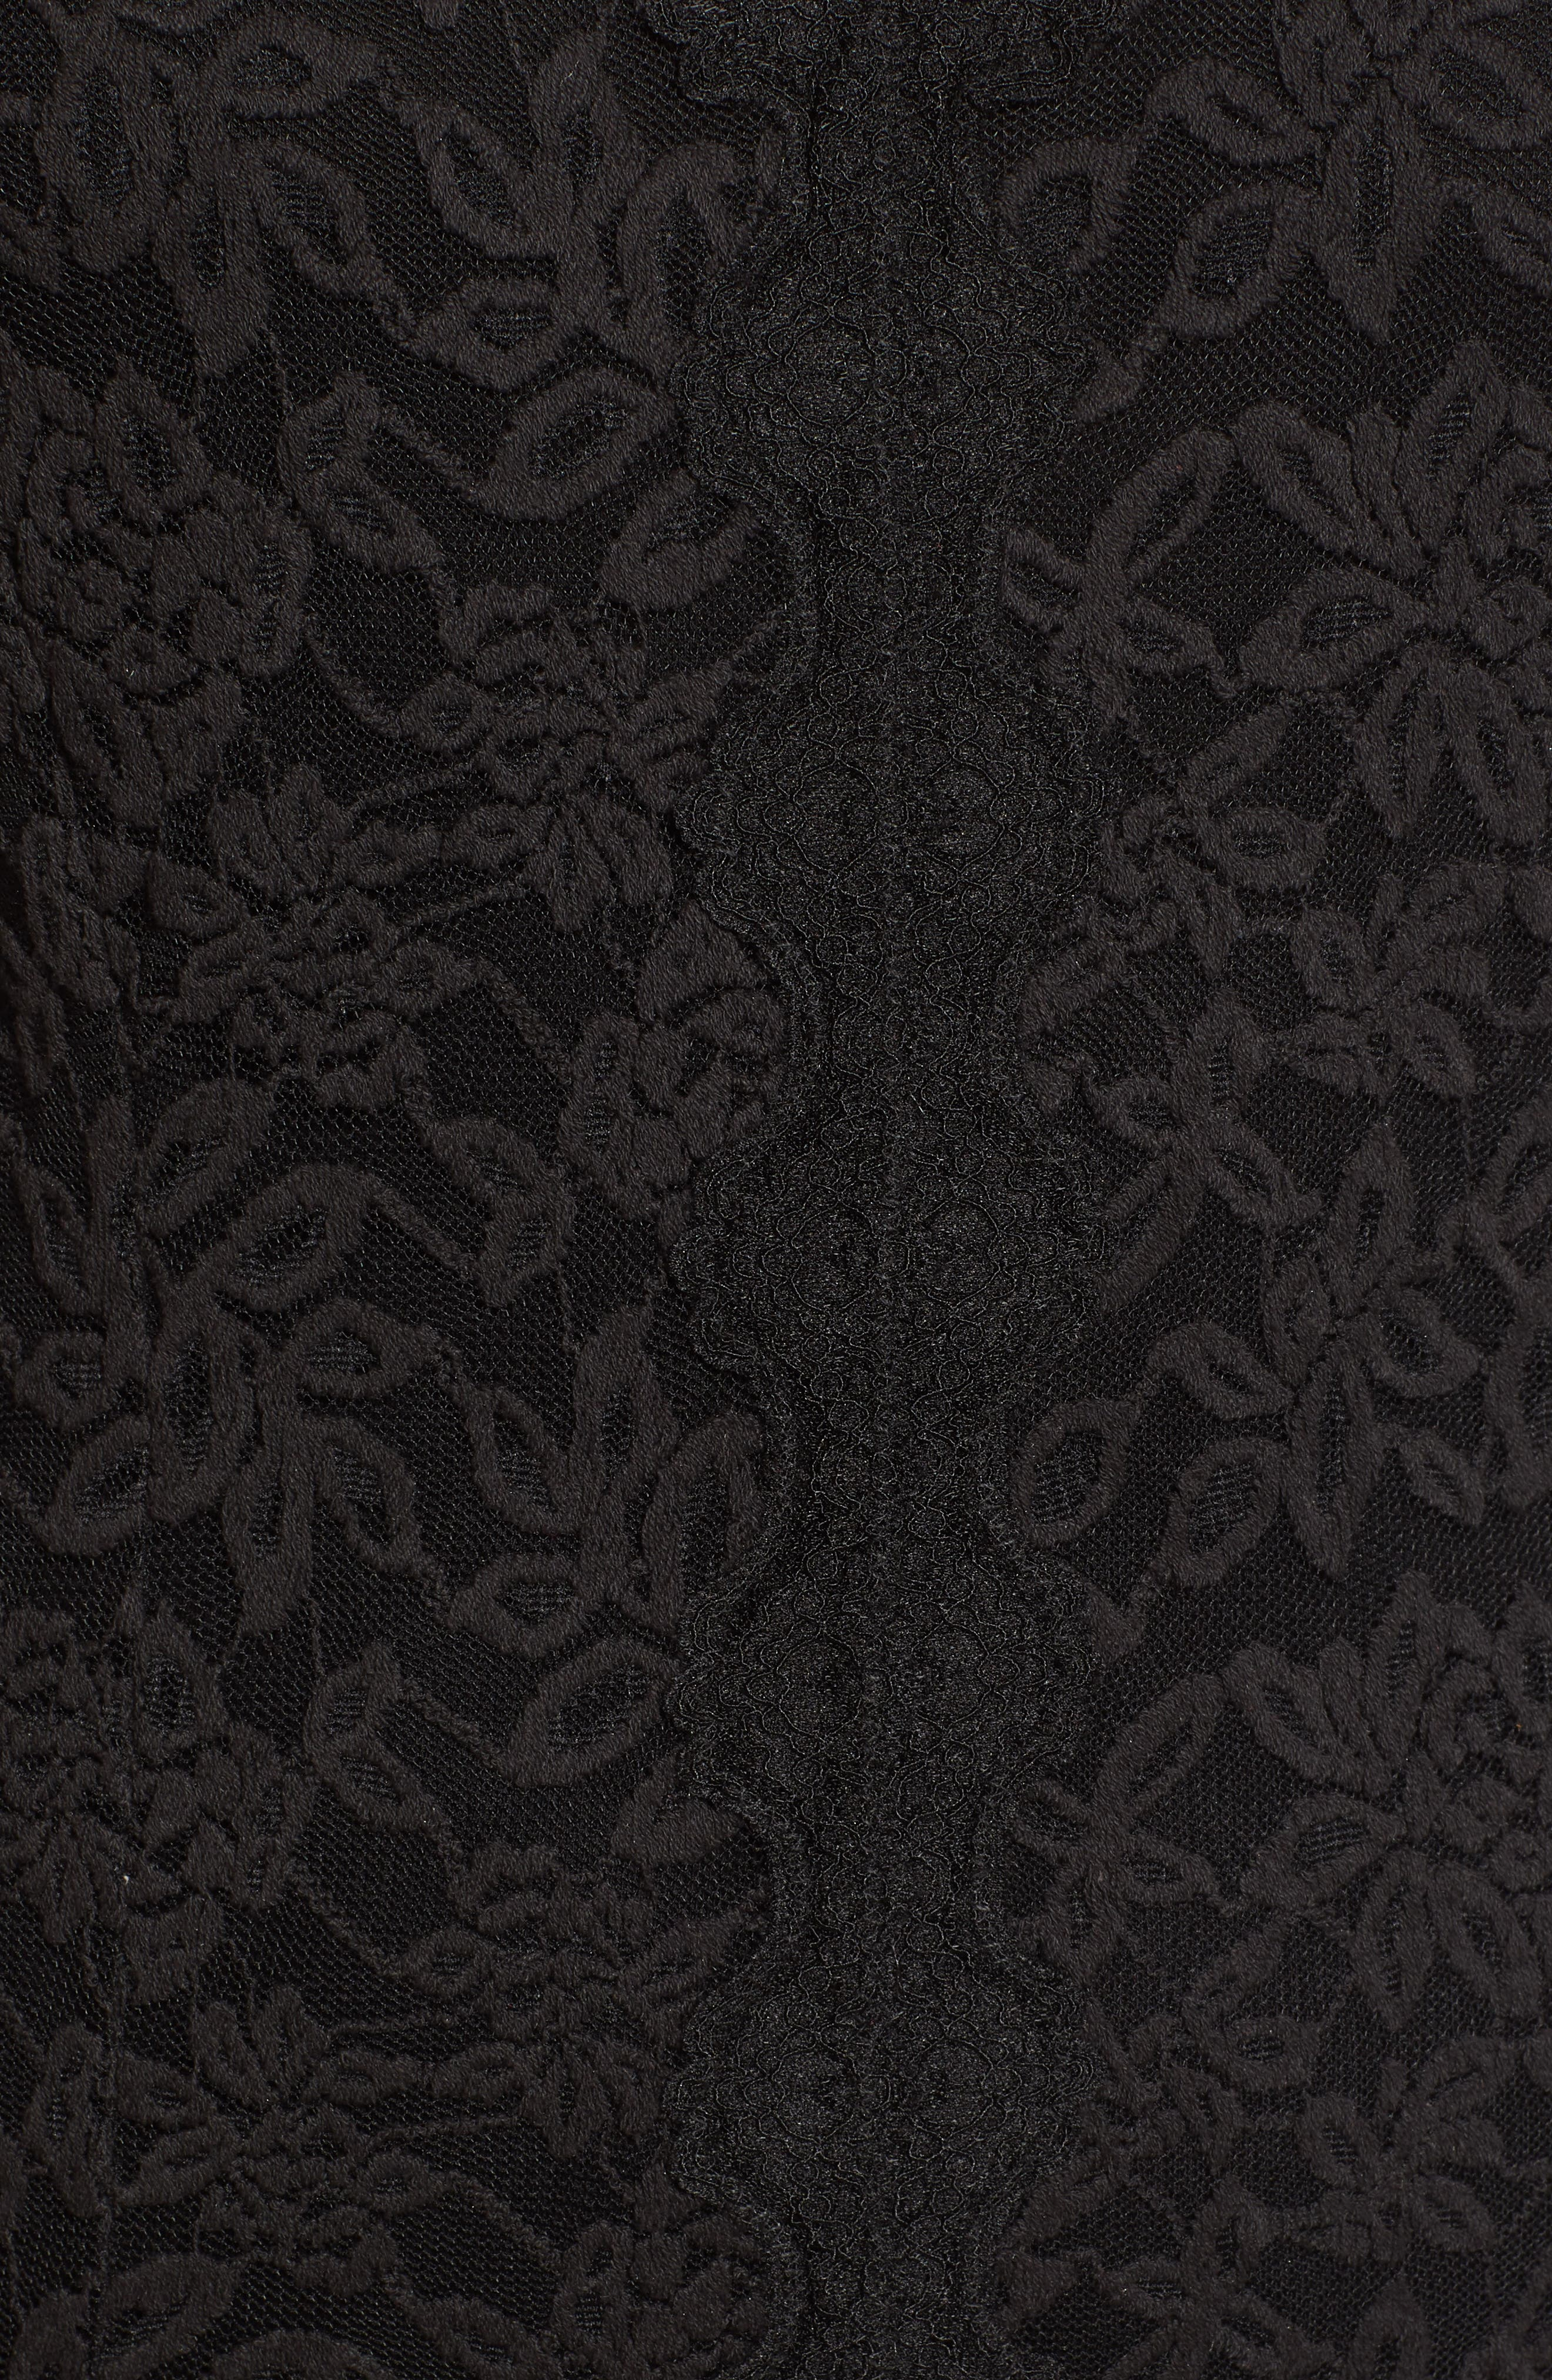 Delicia Fit & Flare Lace Dress,                             Alternate thumbnail 6, color,                             BLACK